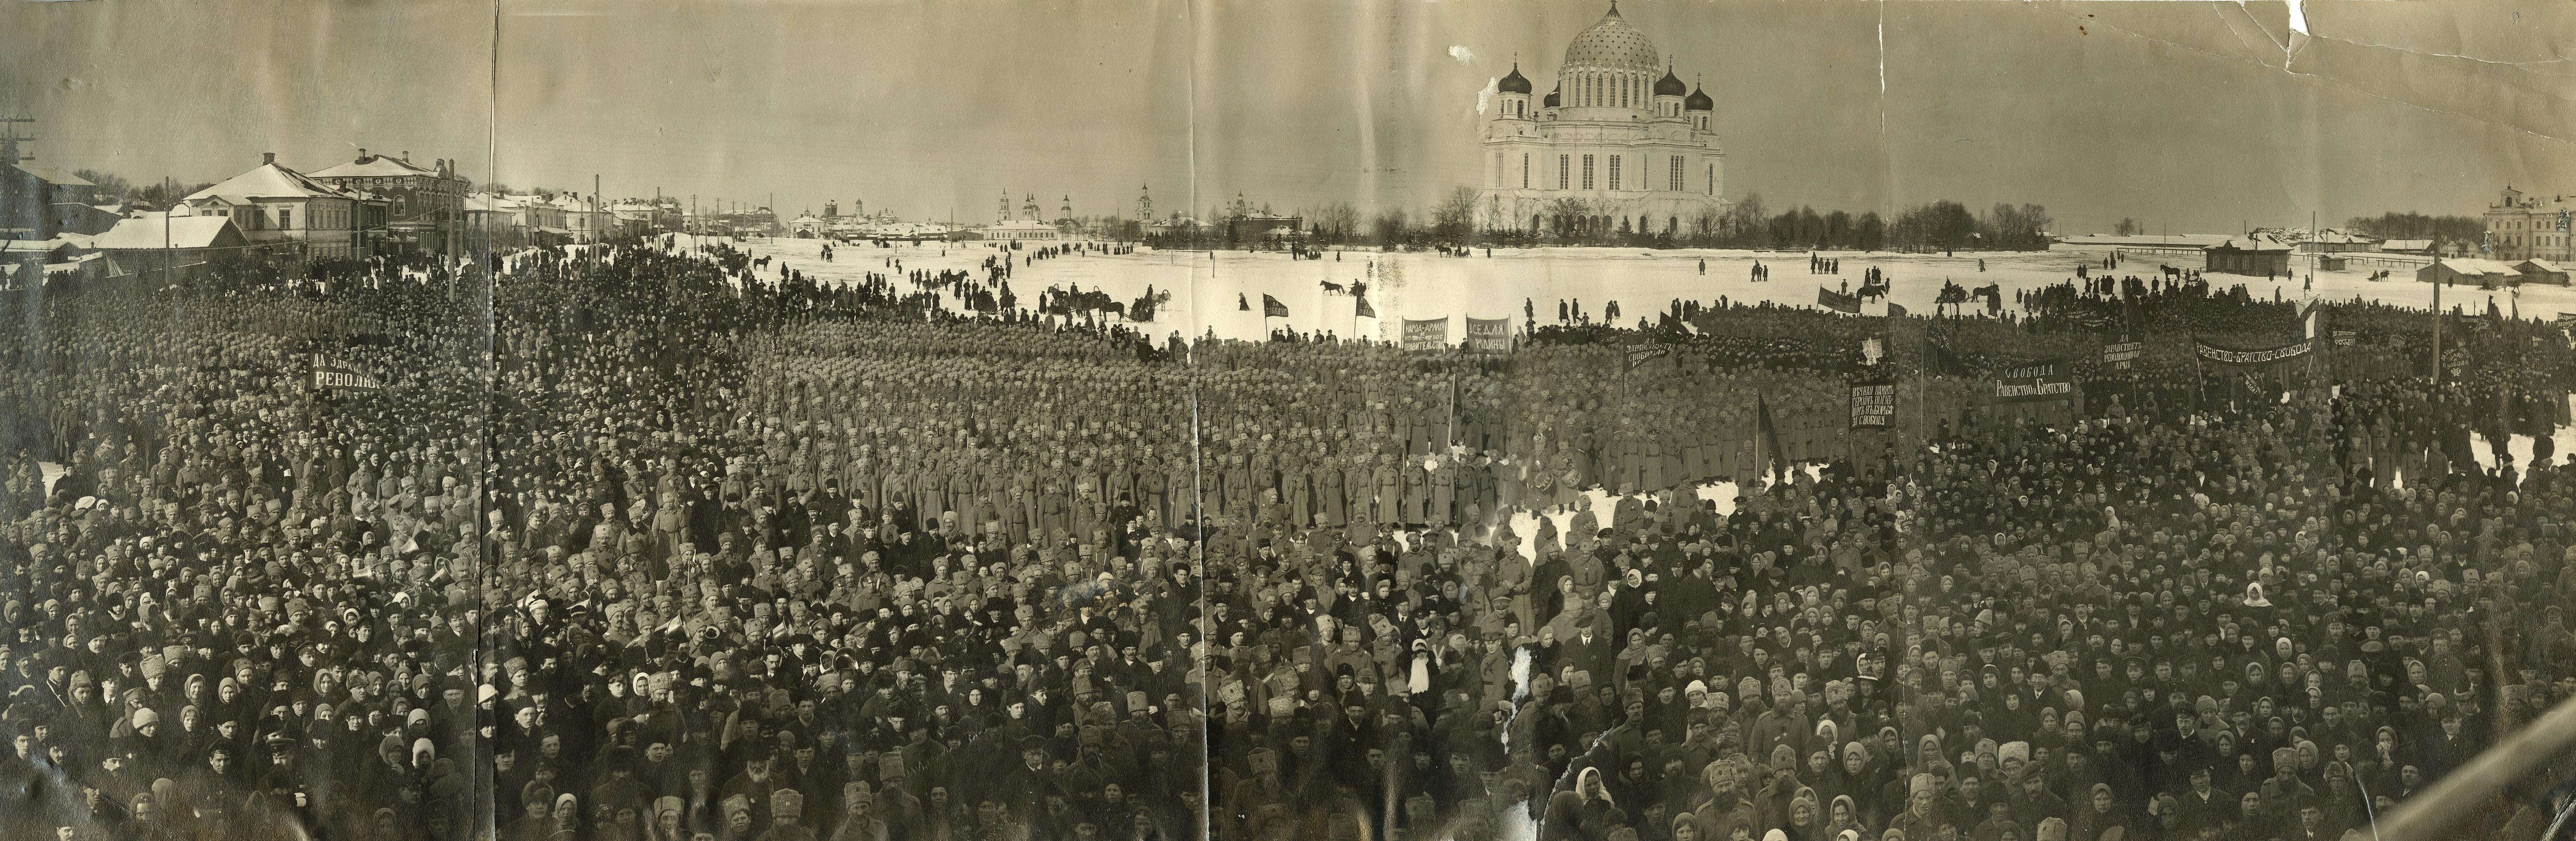 Митинг 12 марта 1917 г. на Александровской площади